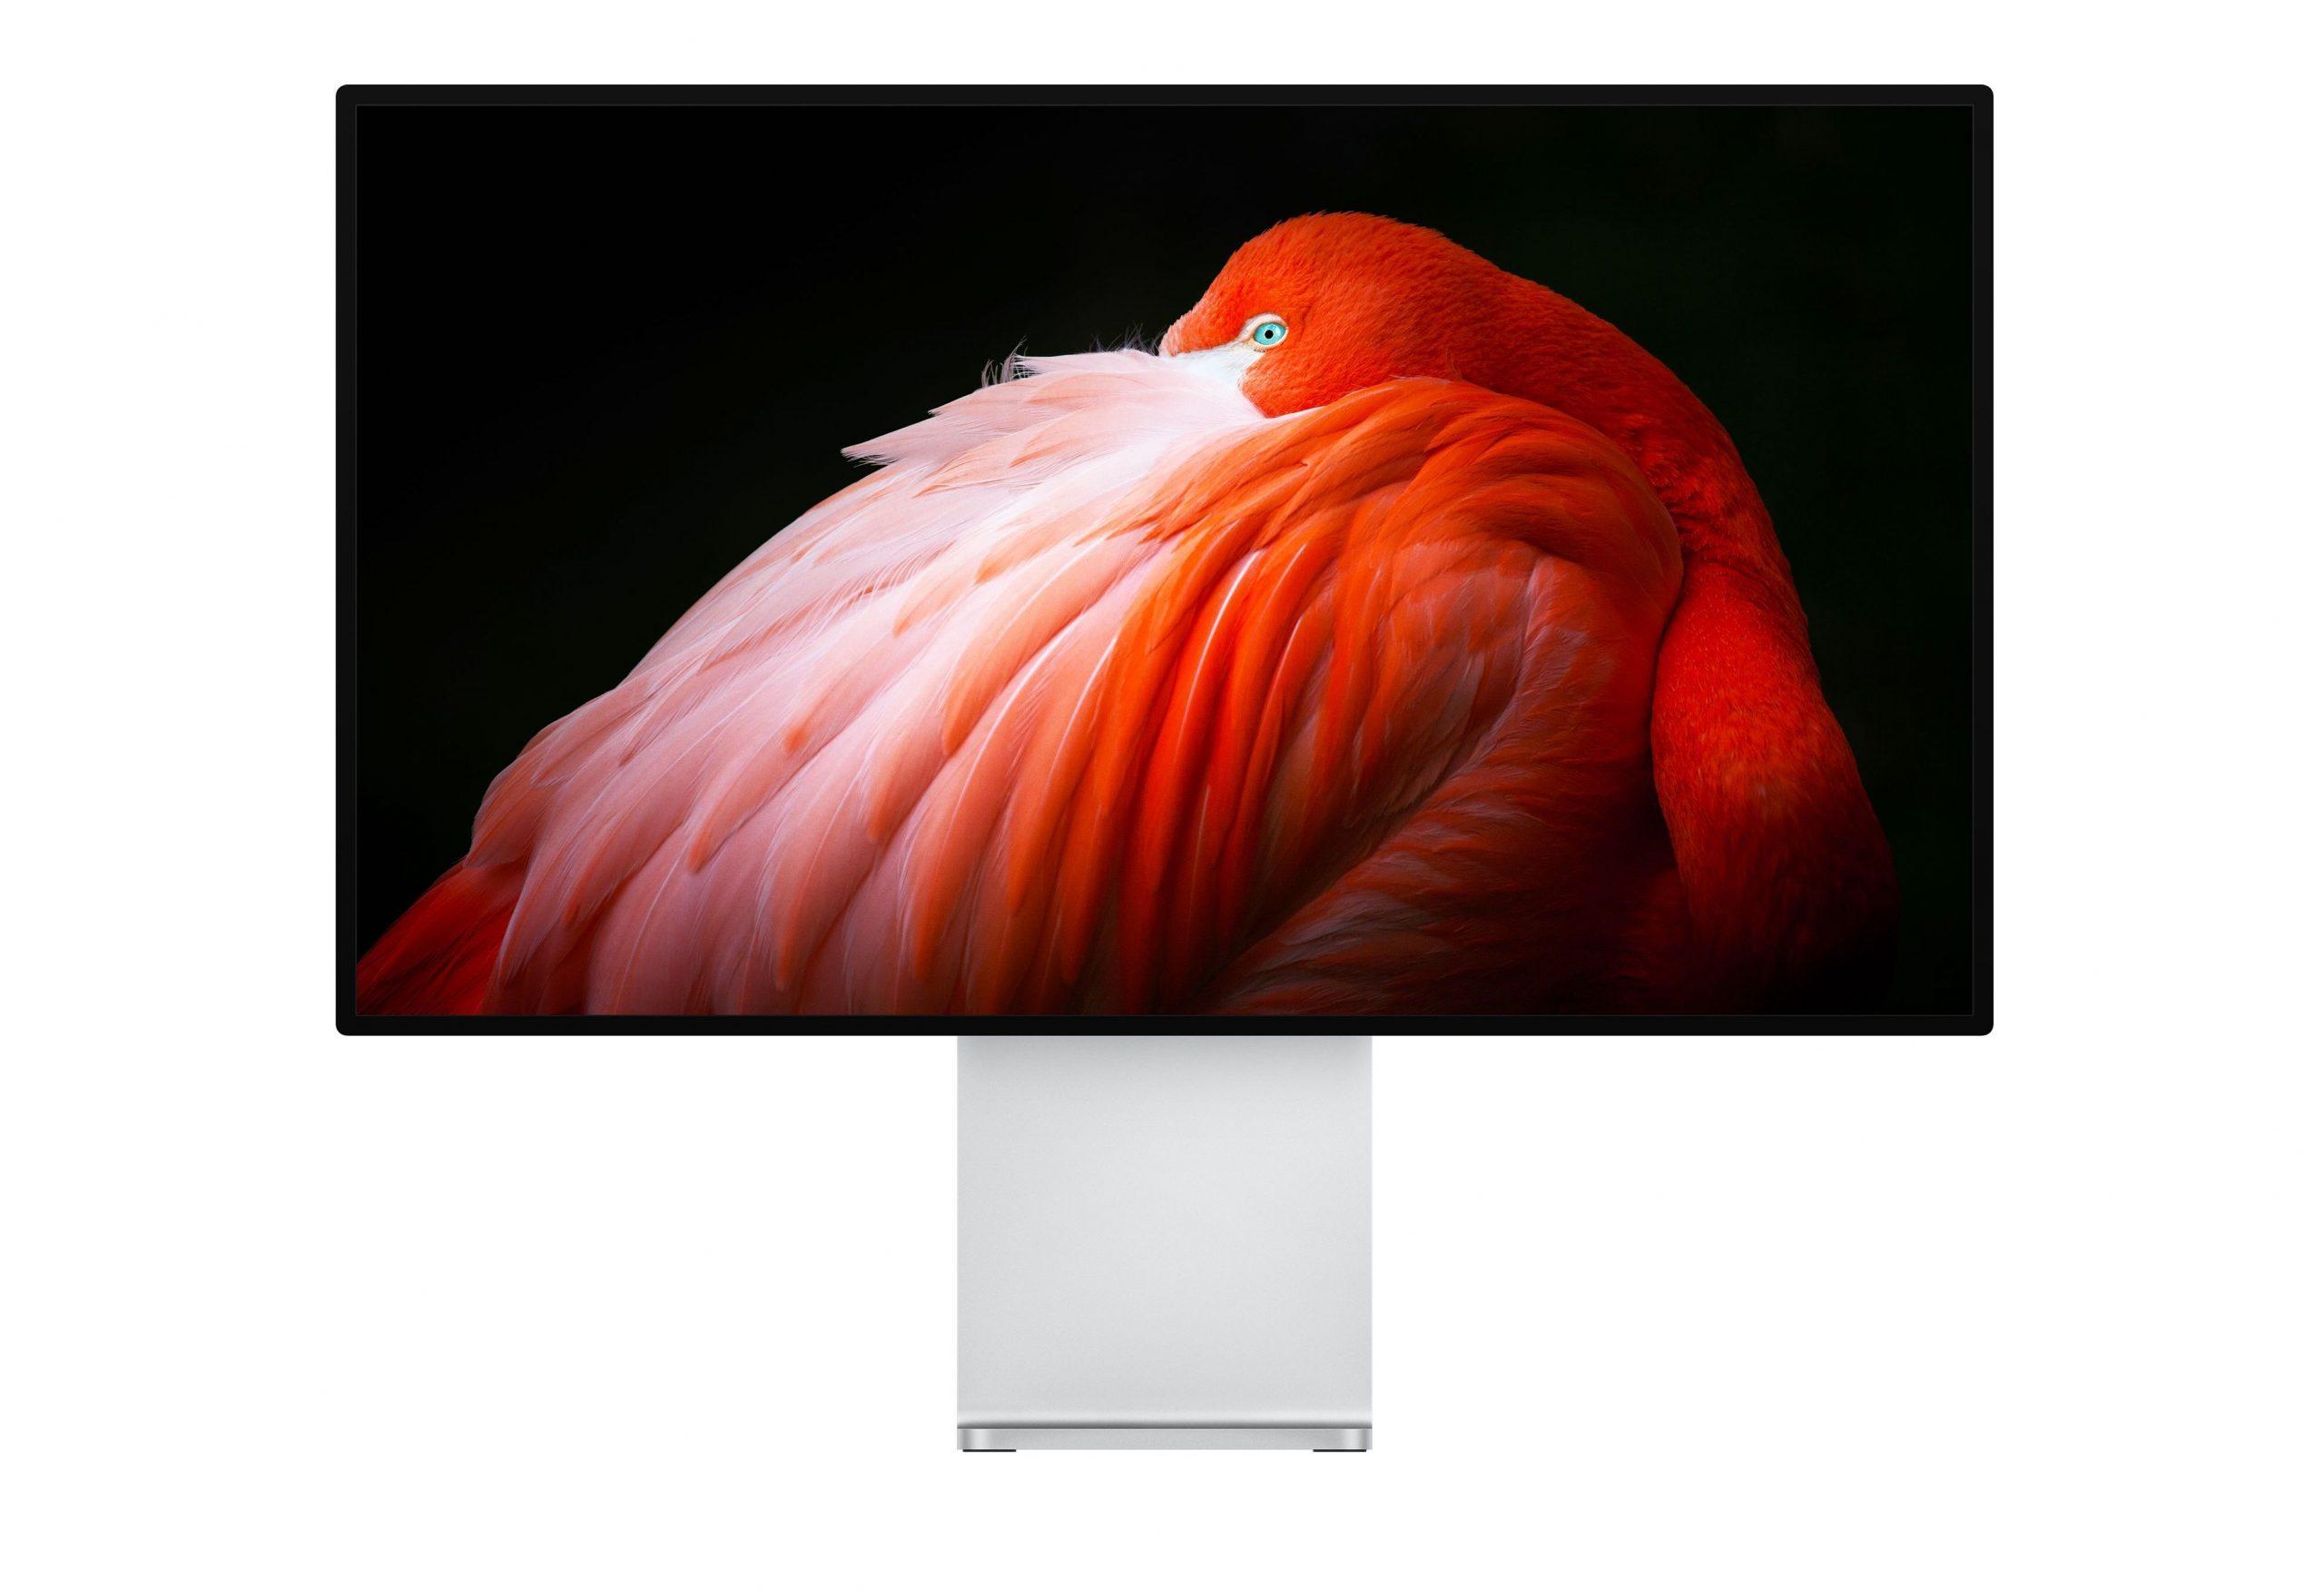 apple_pro_display_xdr_thiet_ke_laptopvang.com